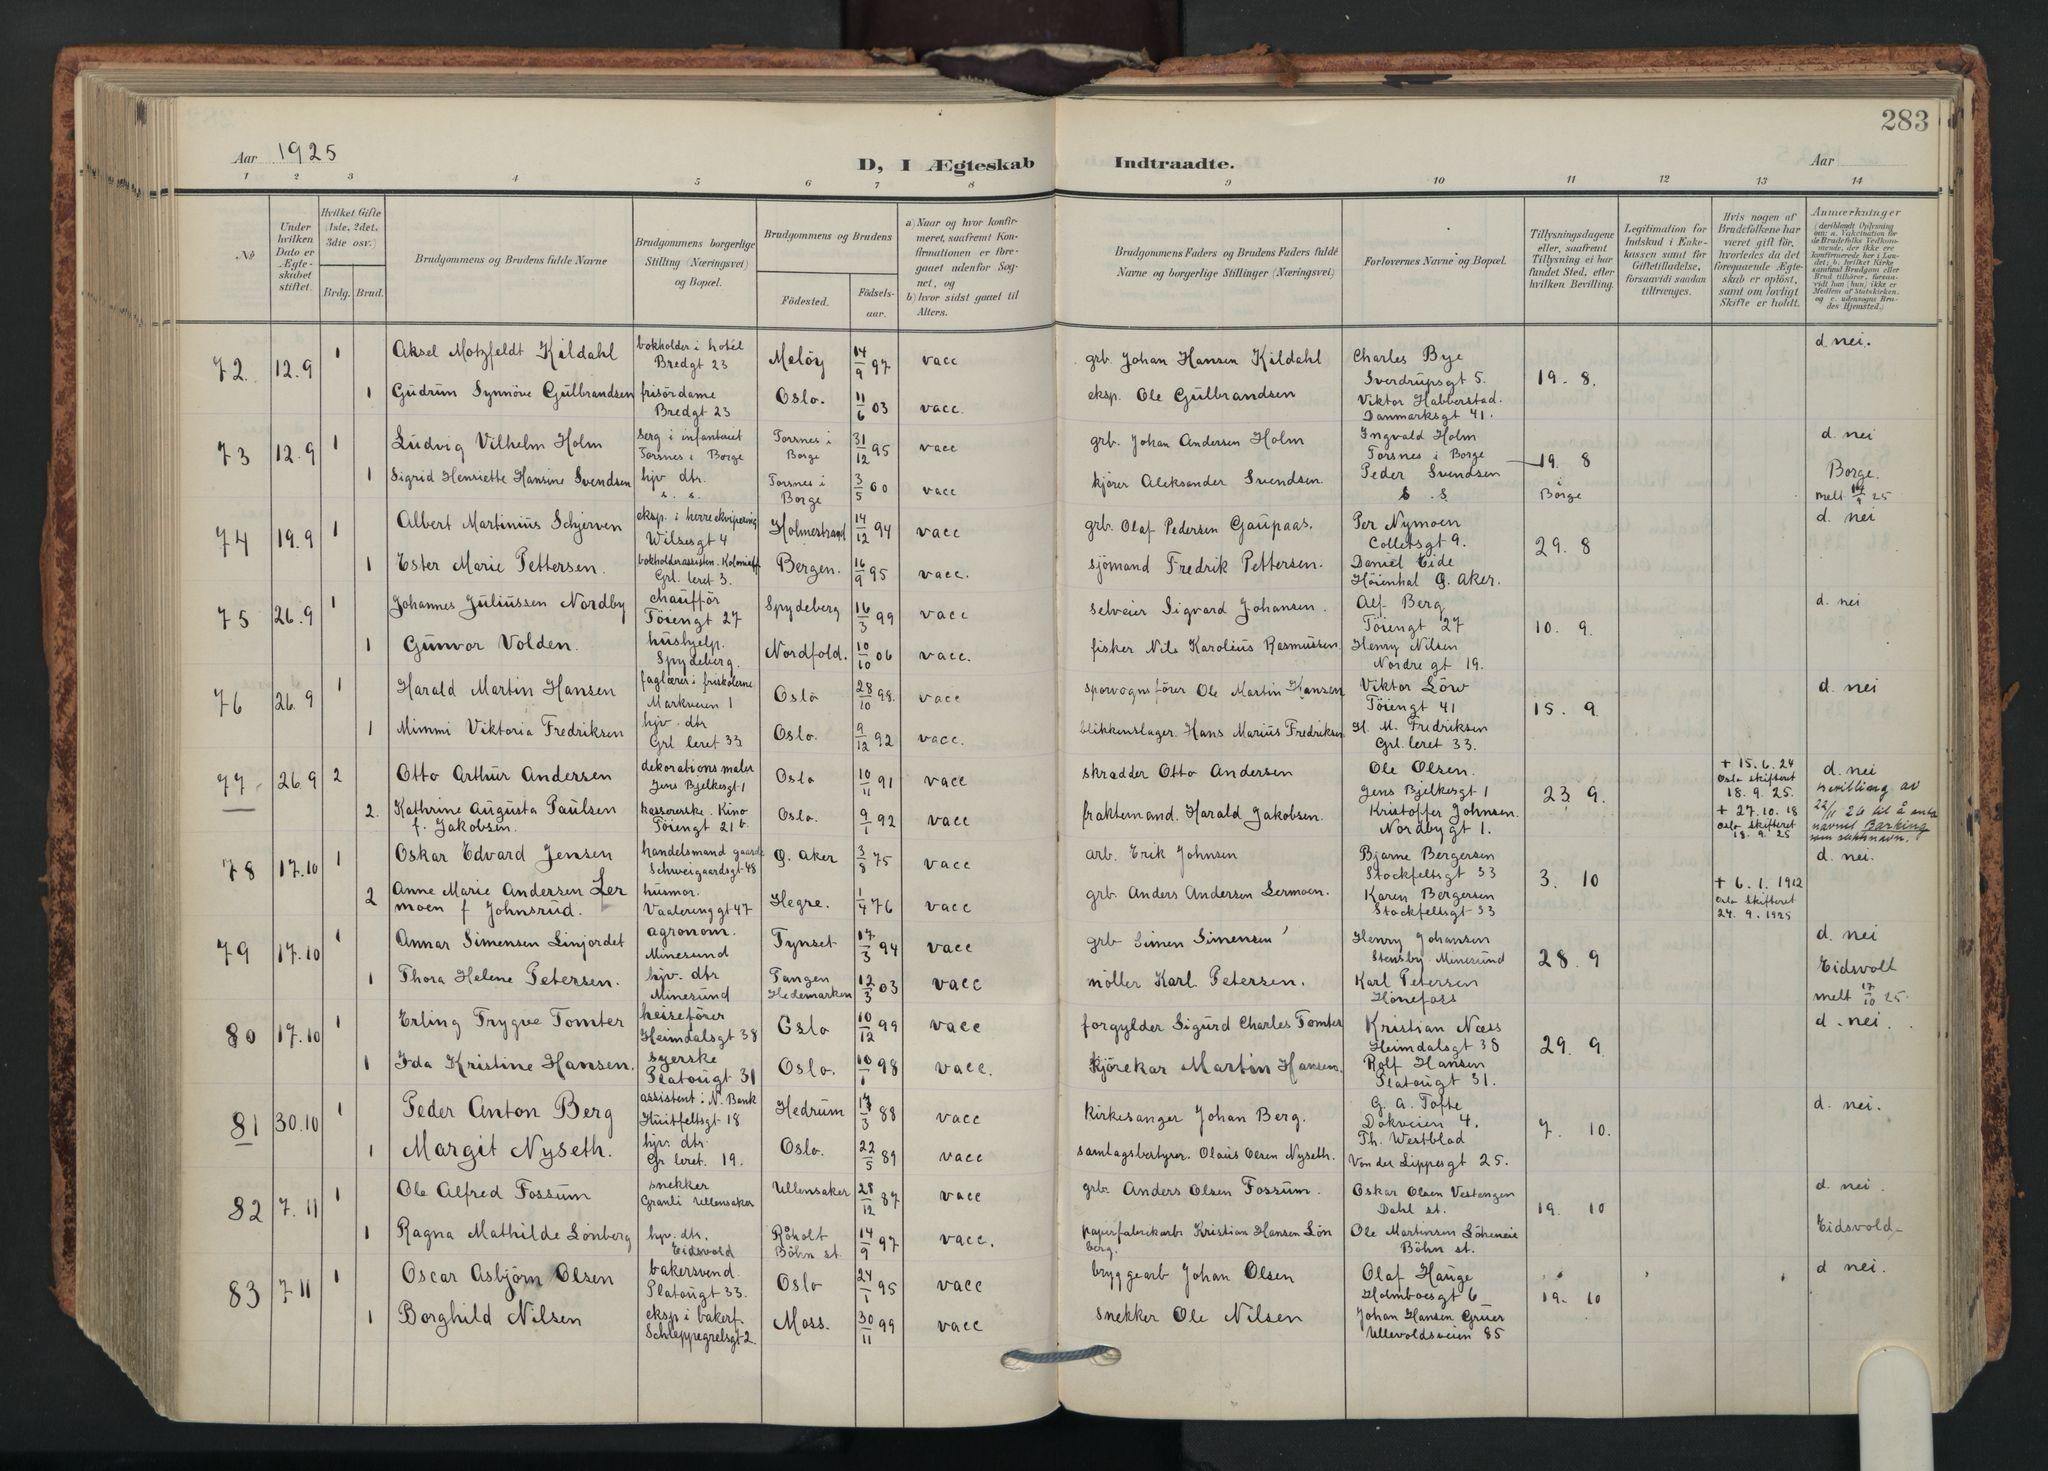 SAO, Grønland prestekontor Kirkebøker, F/Fa/L0017: Ministerialbok nr. 17, 1906-1934, s. 283